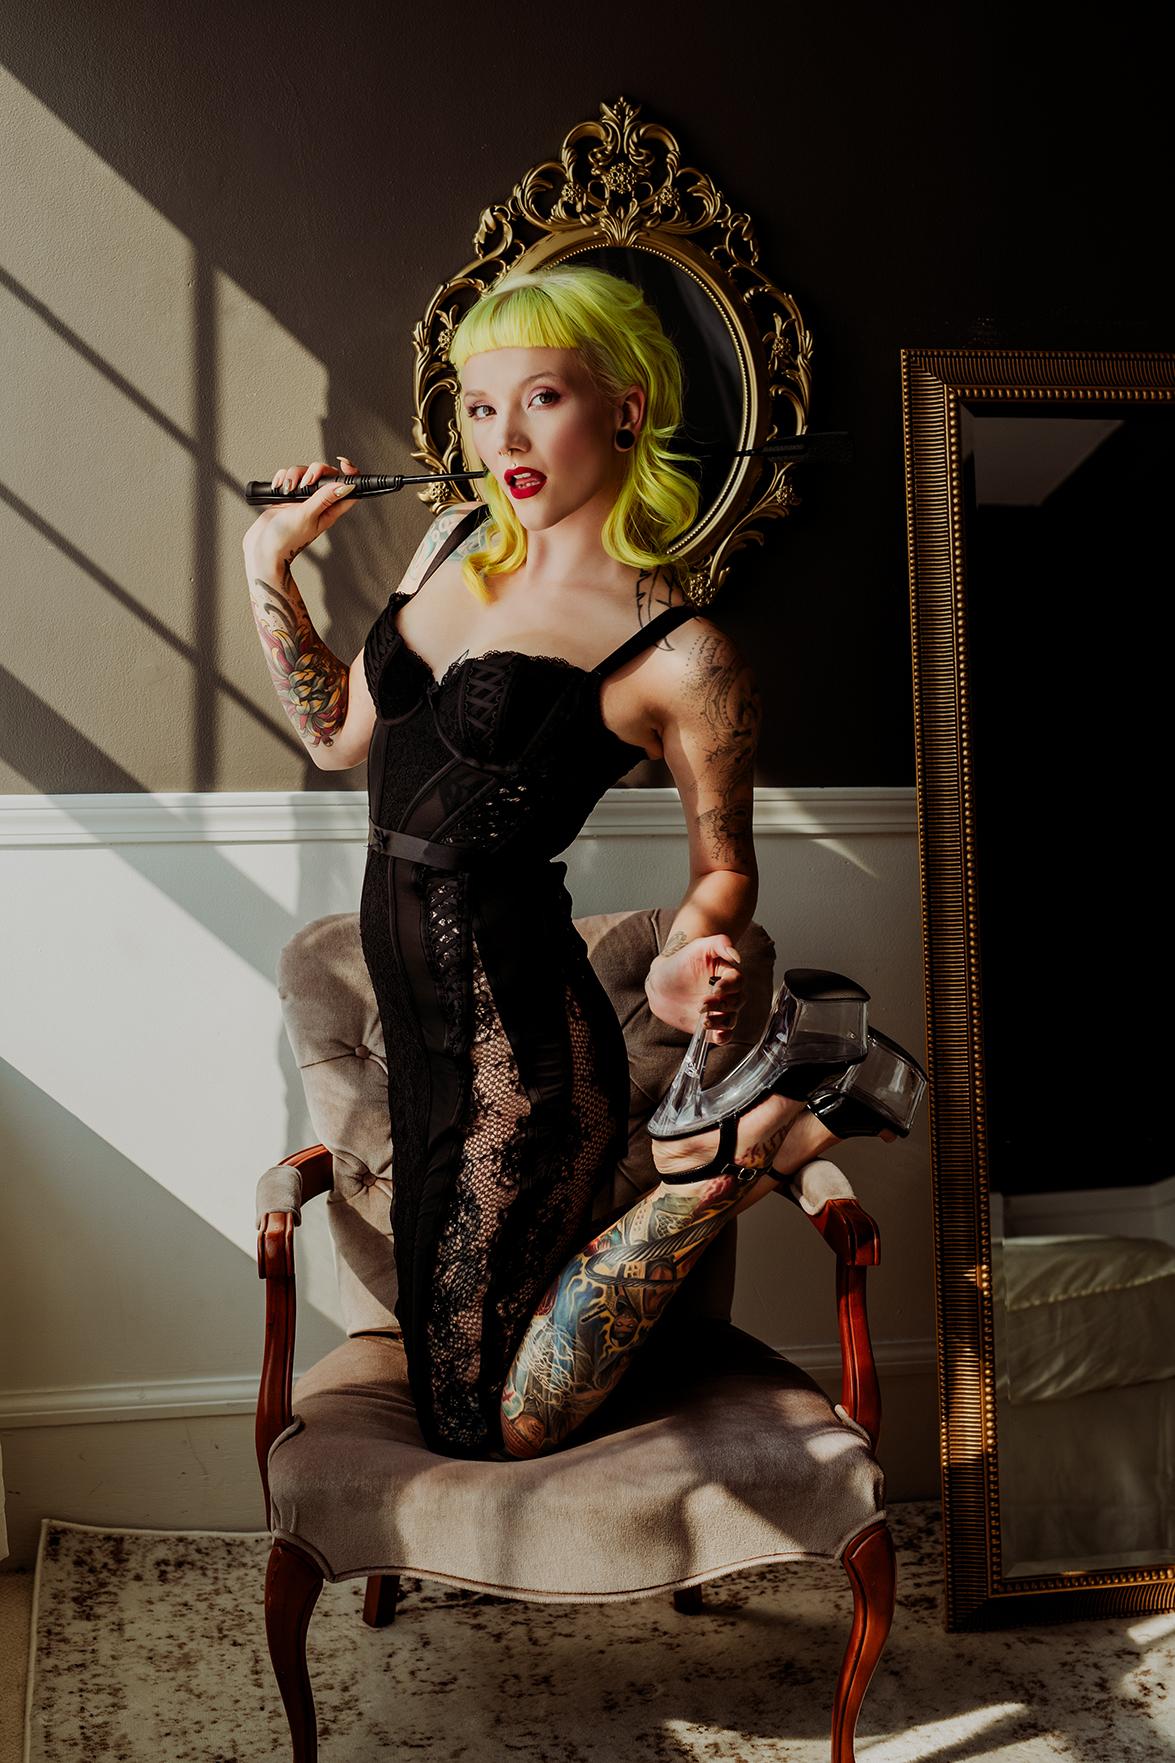 victoria-bc-glamour-photography--6.jpg